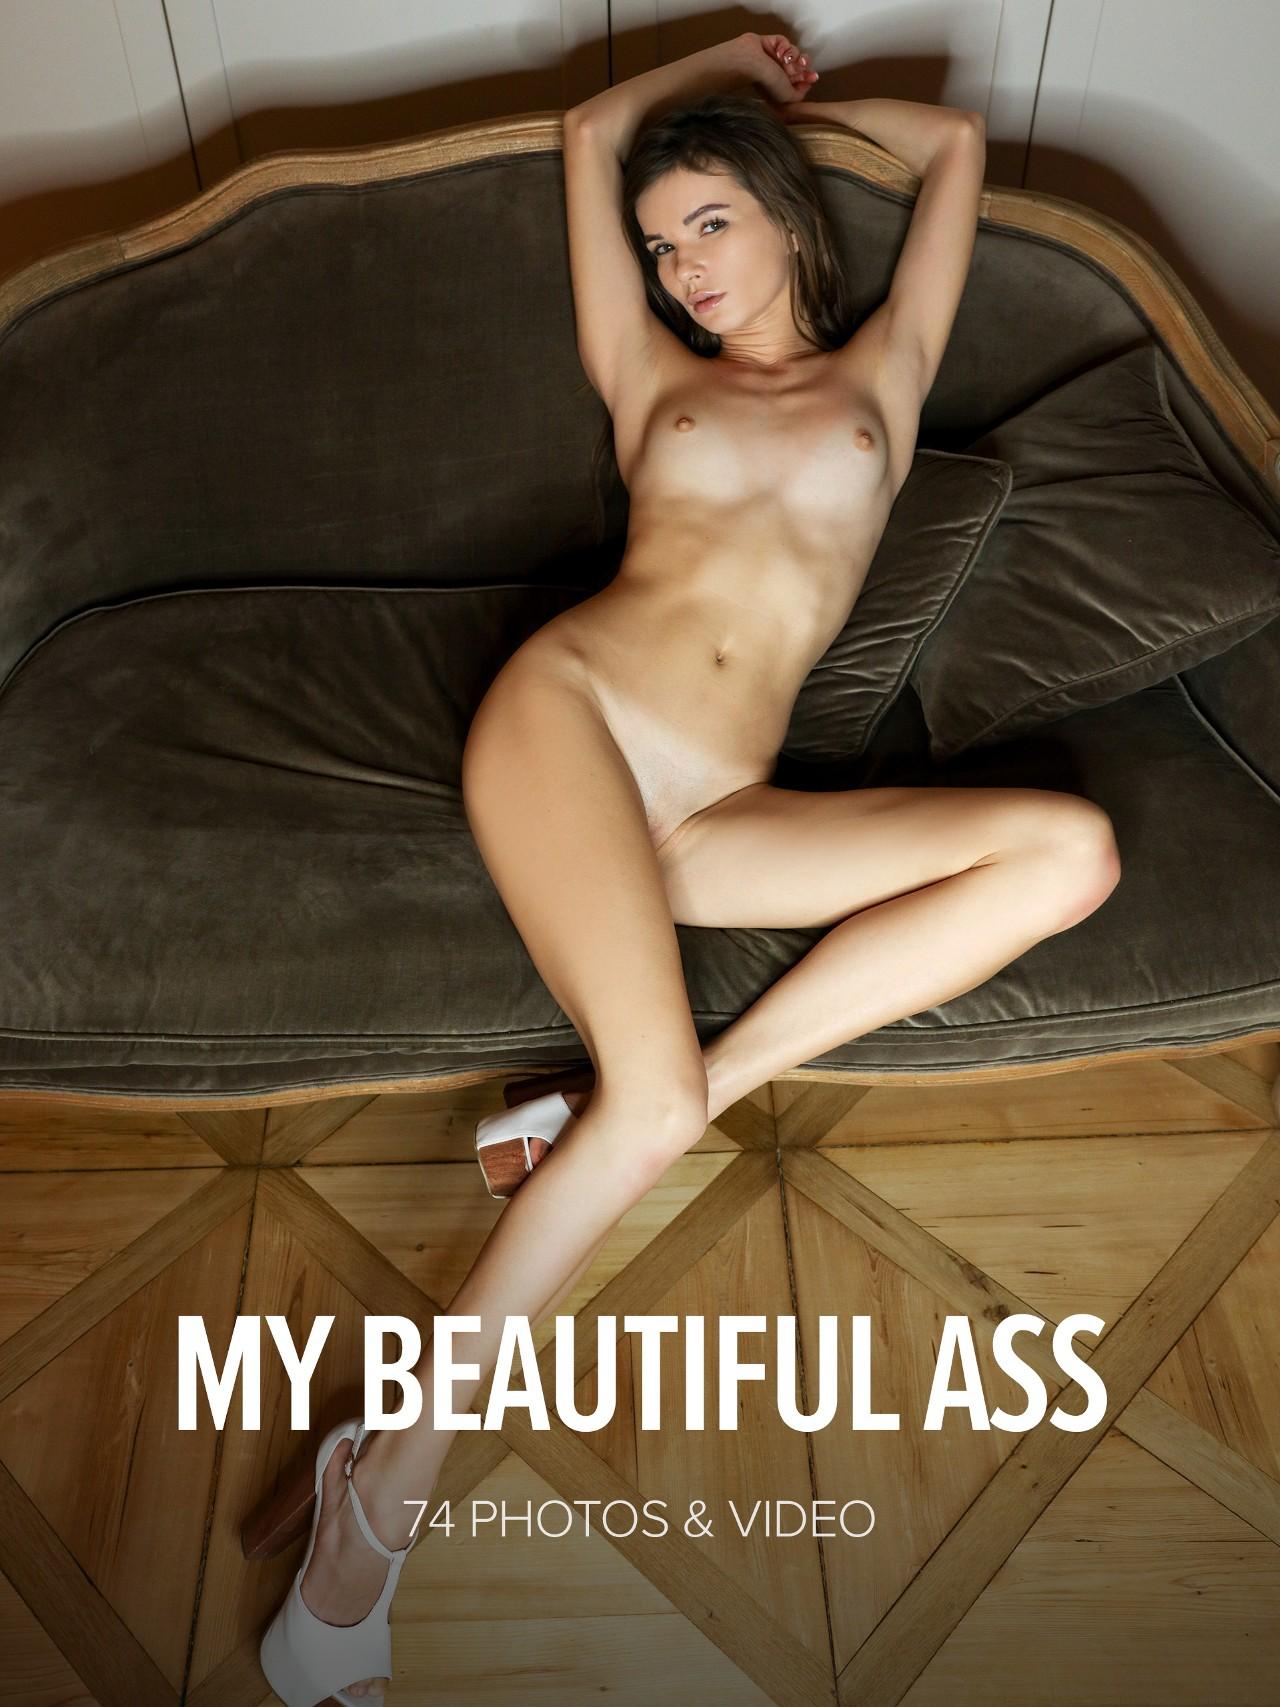 Brit: My Beautiful Ass